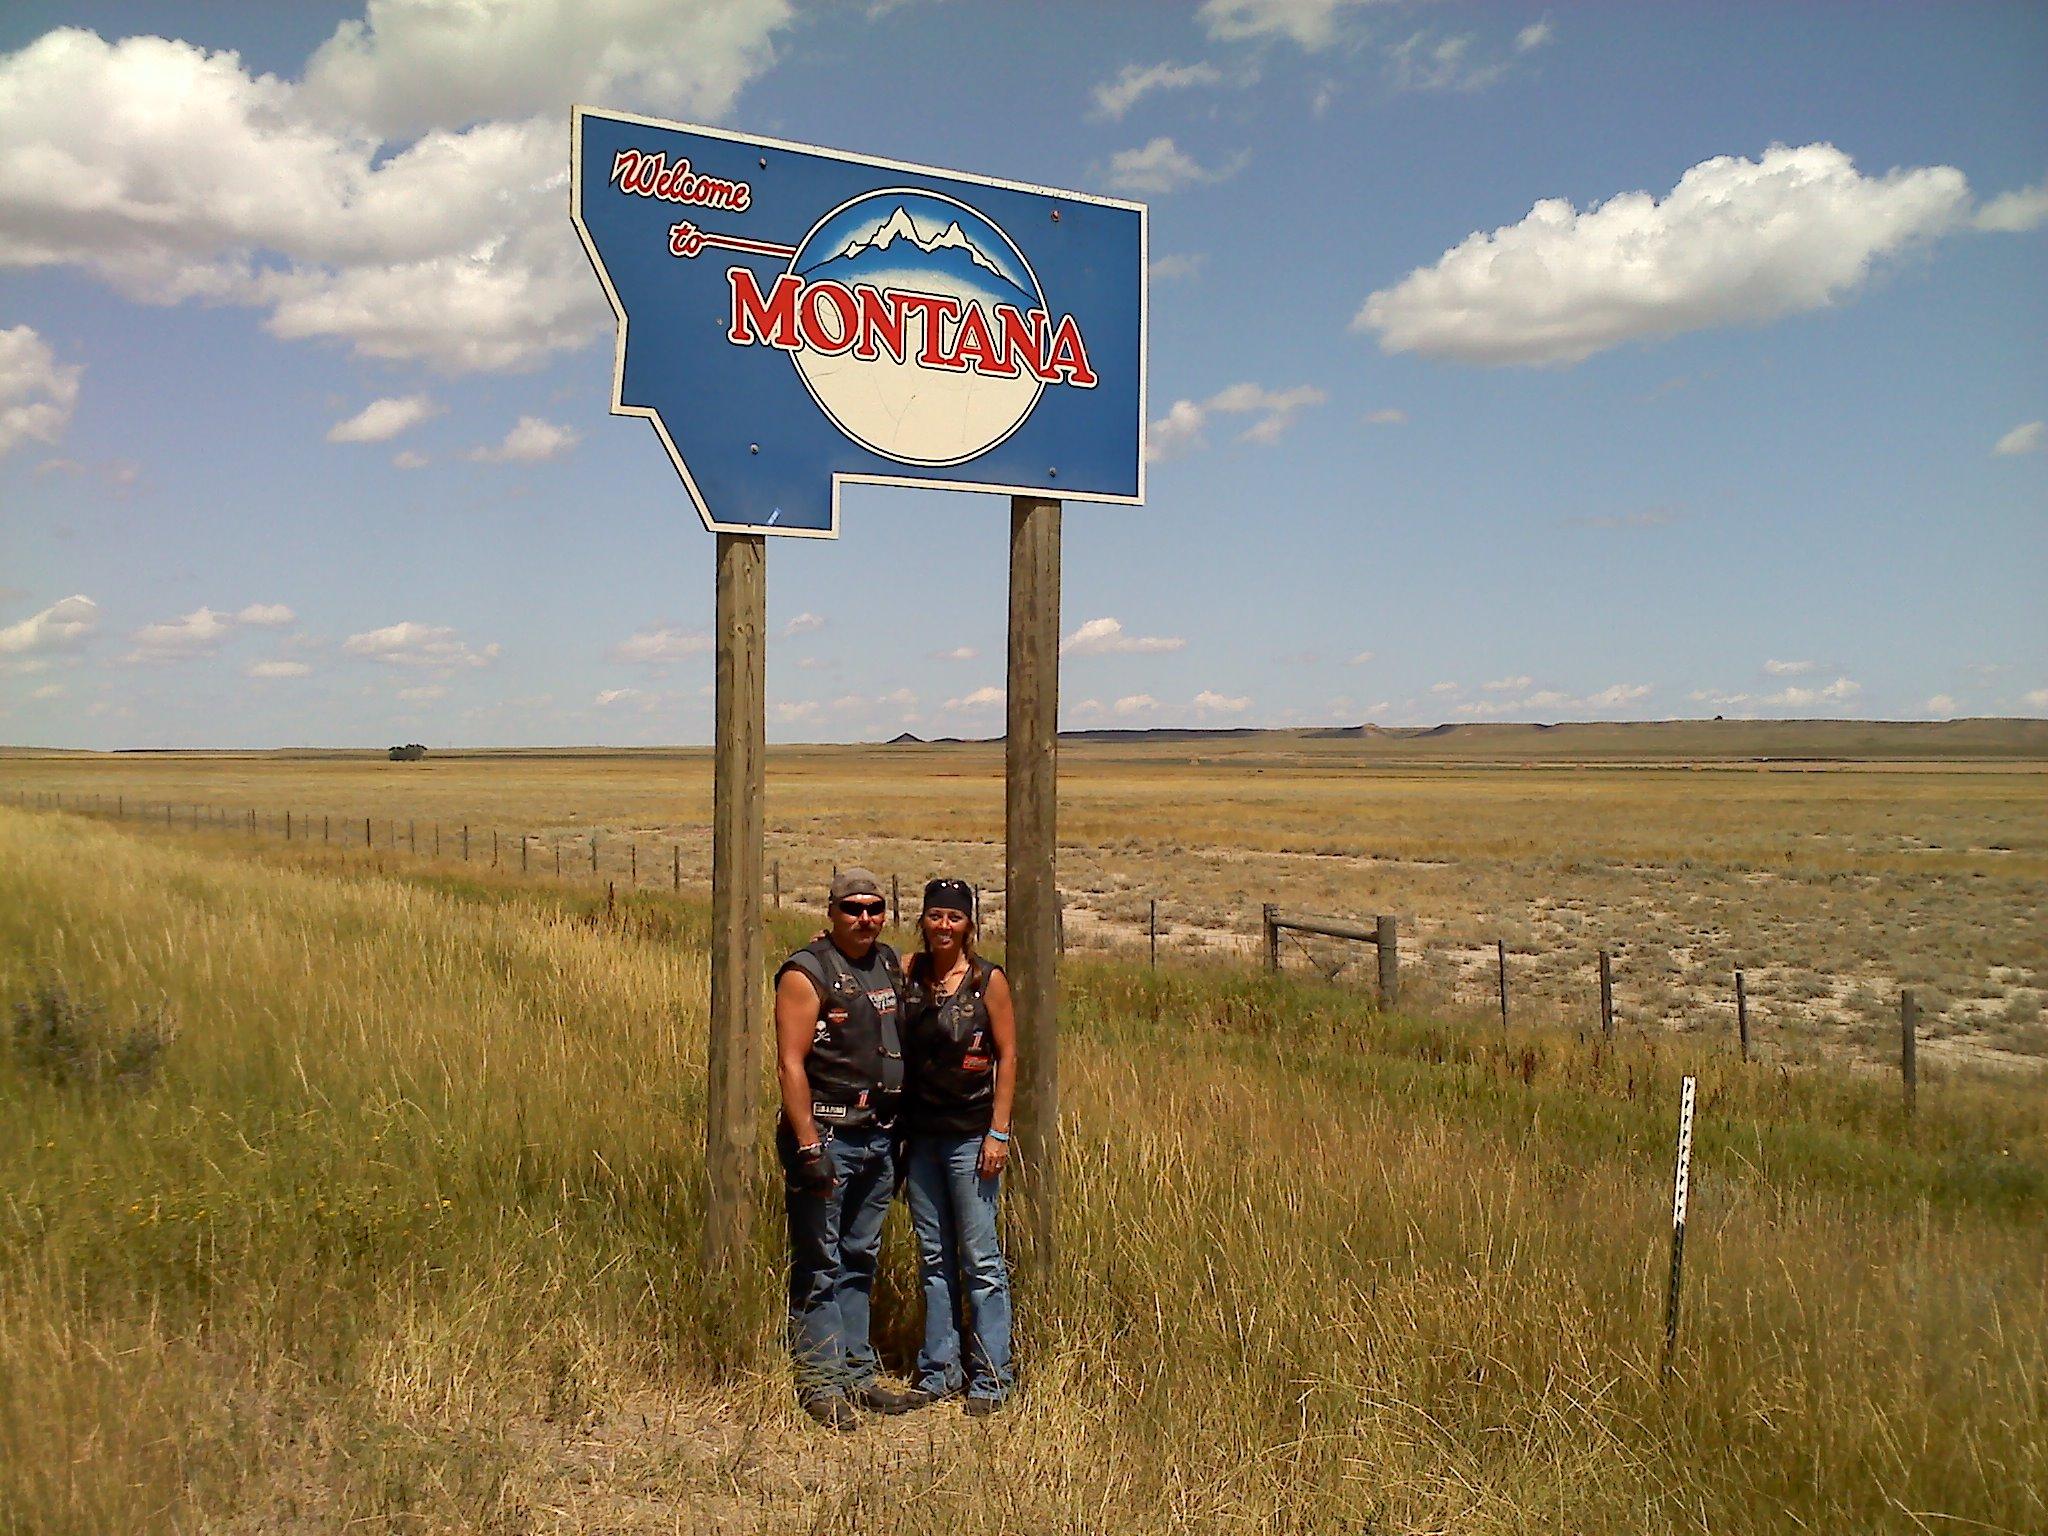 Montana state line